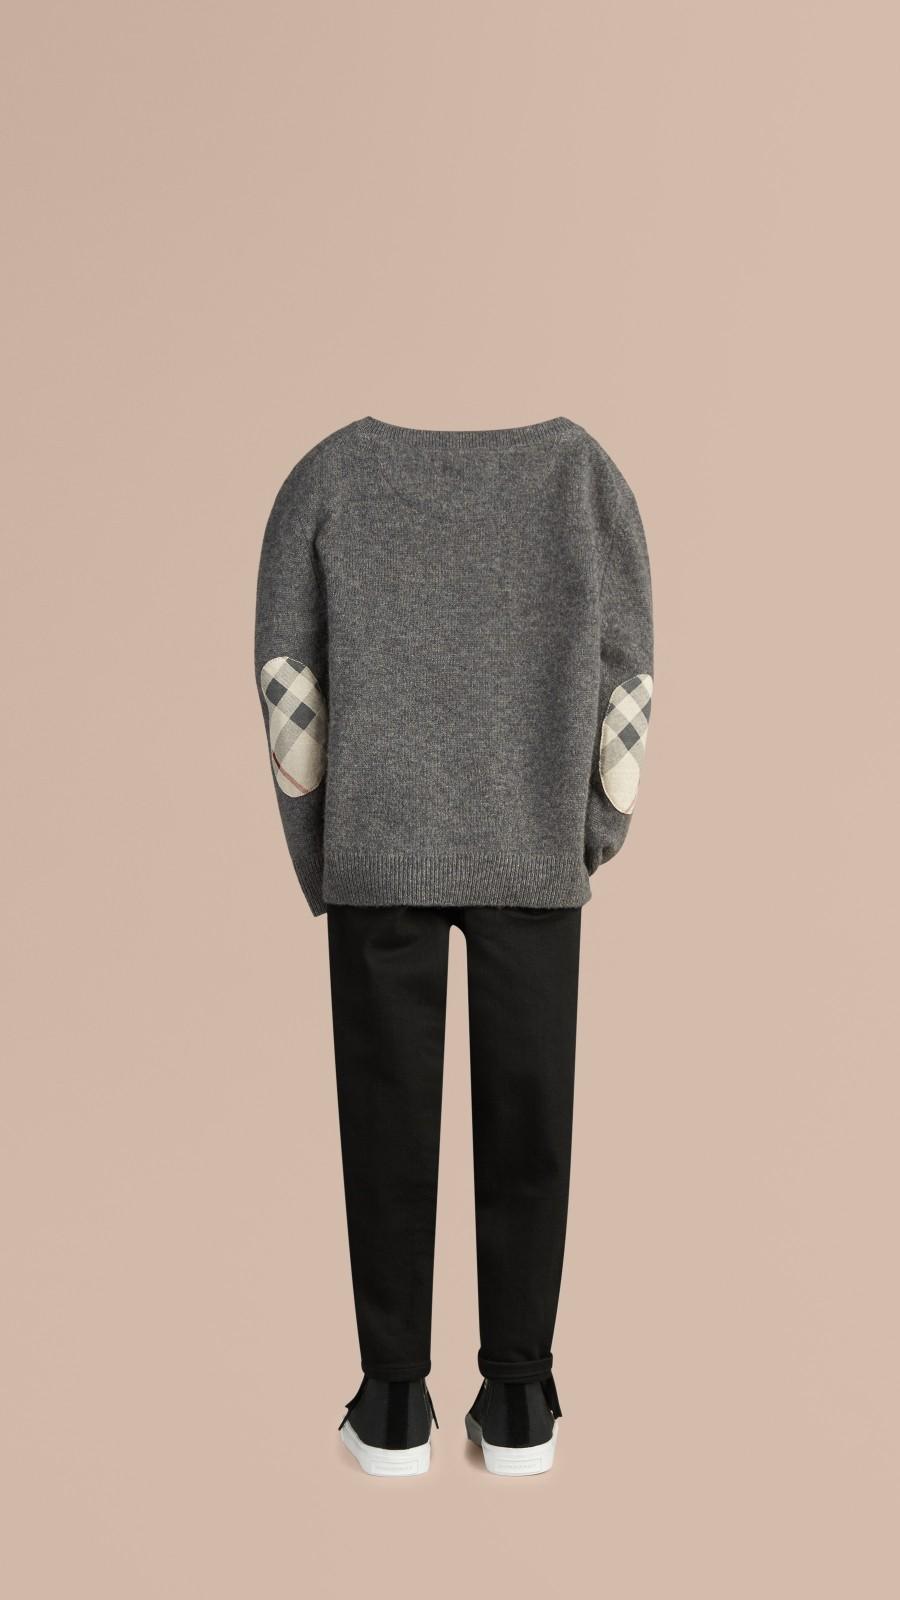 Mid grey melange Check Elbow Patch Cashmere Sweater Mid Grey Melange - Image 3